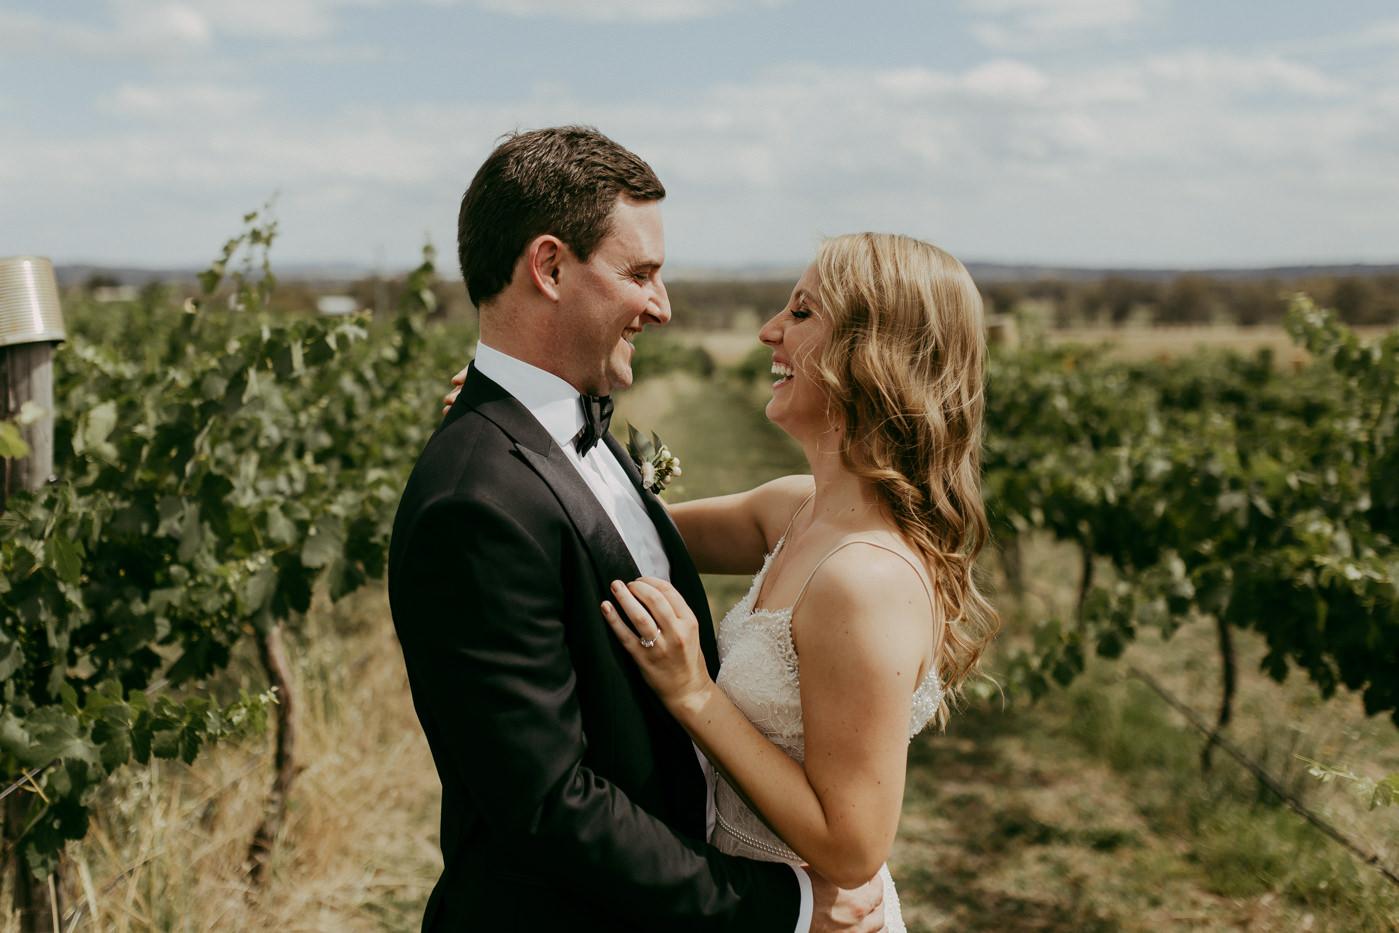 Anthony & Eliet - Wagga Wagga Wedding - Country NSW - Samantha Heather Photography-71.jpg